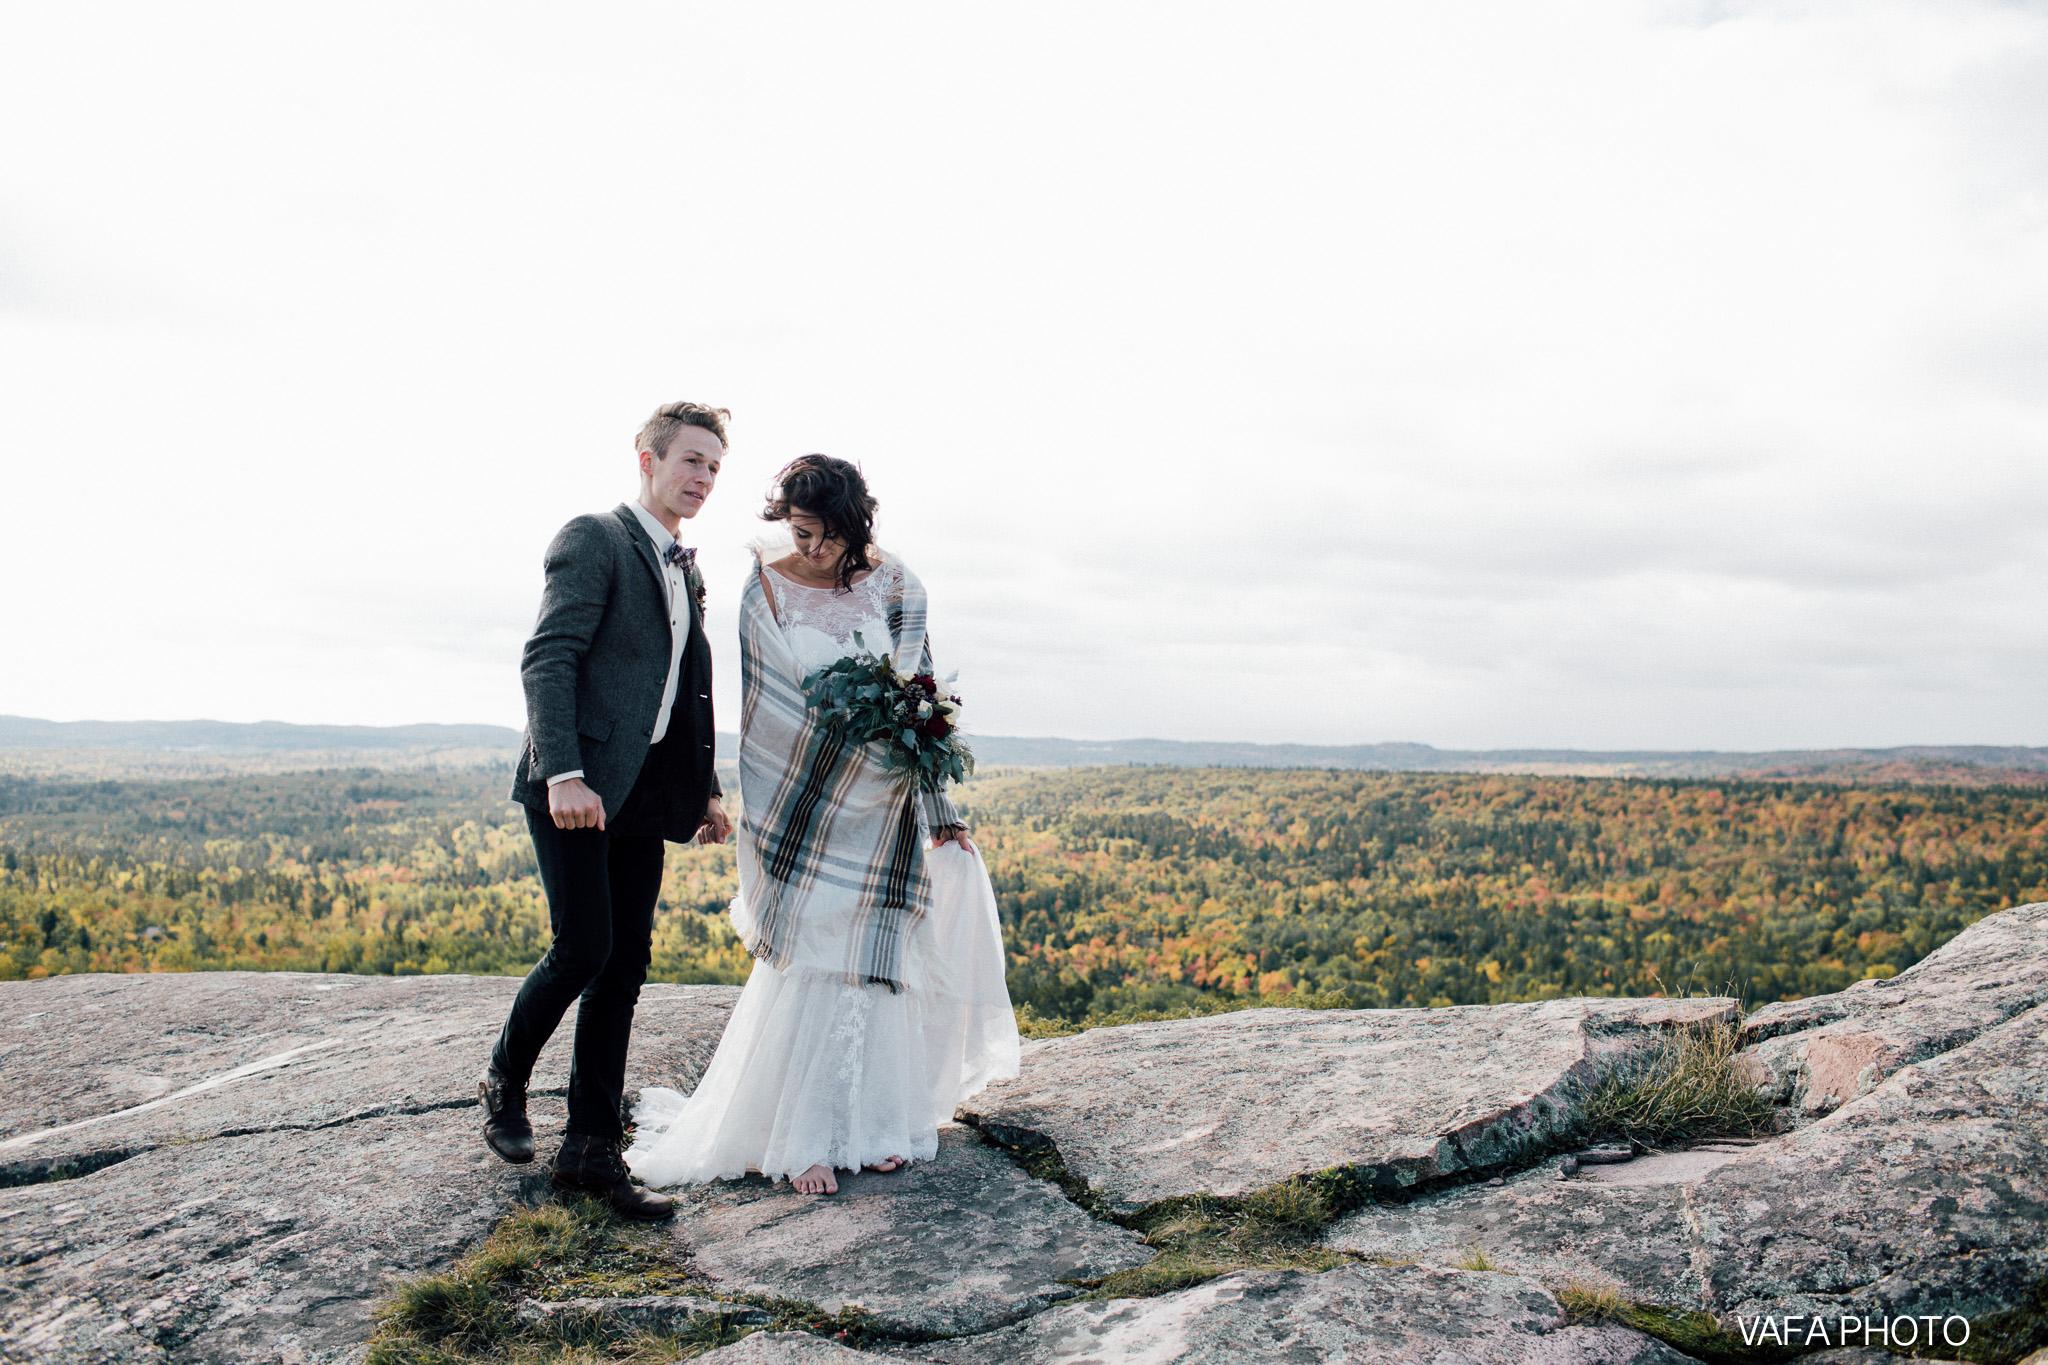 Hogback-Mountain-Wedding-Chelsea-Josh-Vafa-Photo-427.jpg